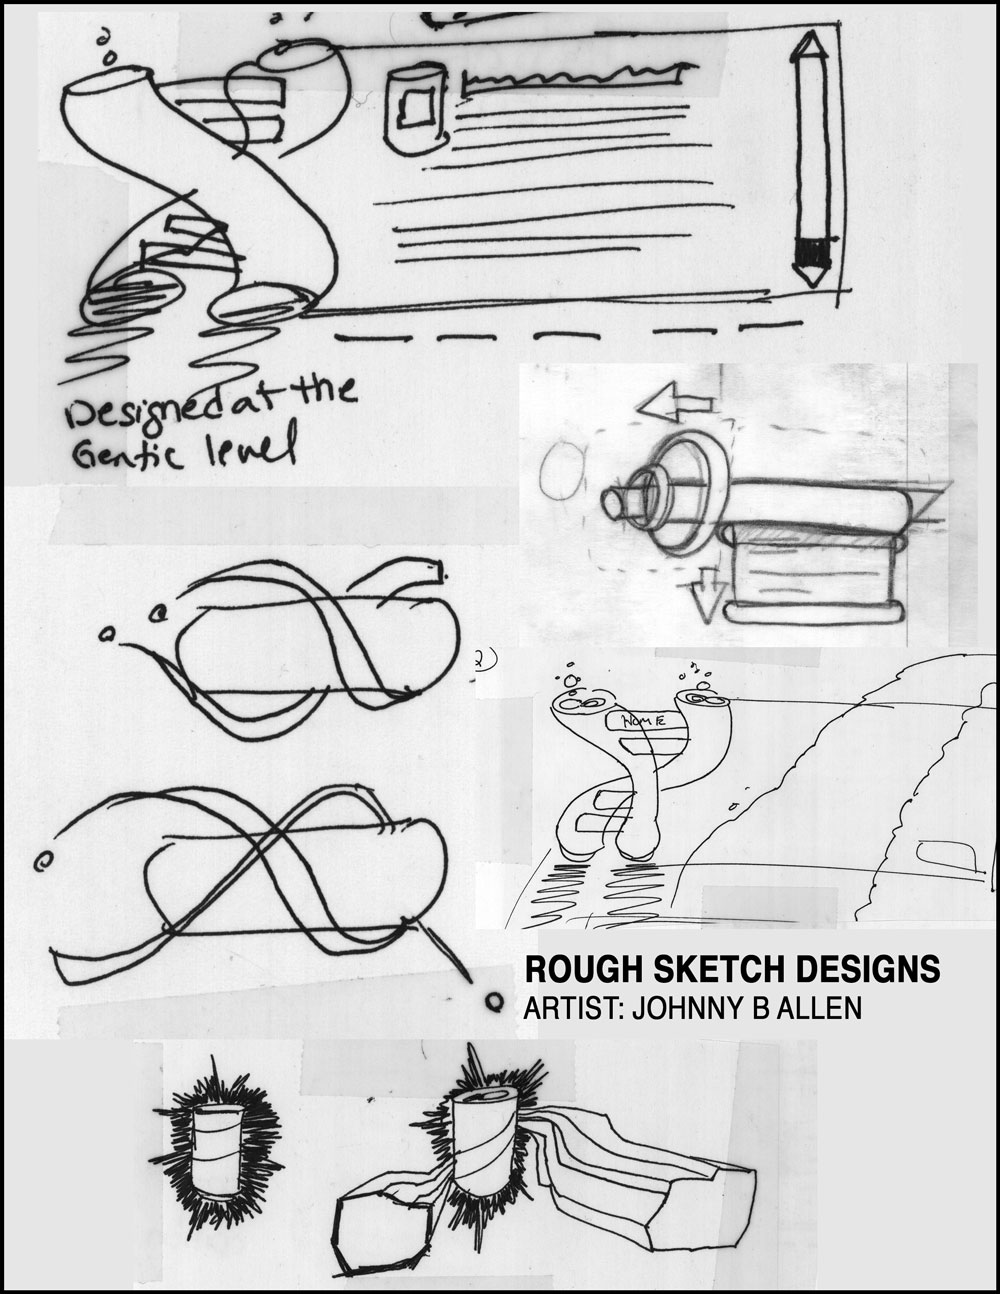 Rough pencil and ink concept sketch designs by Johnny B Allen